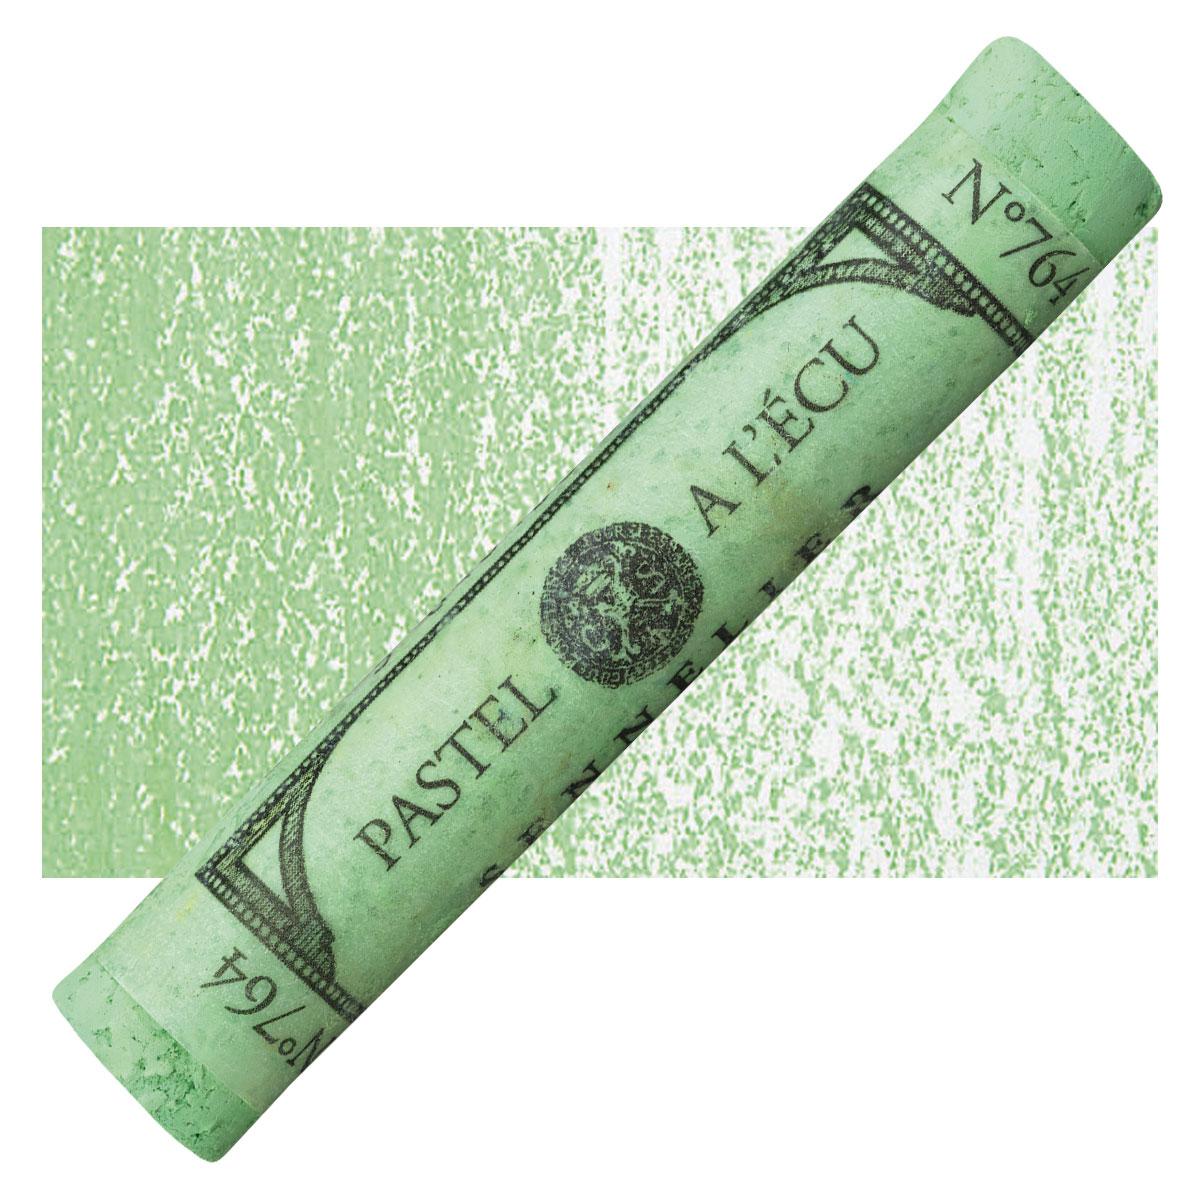 20036 0809 Sennelier Soft Pastel Sets Blick Art Materials